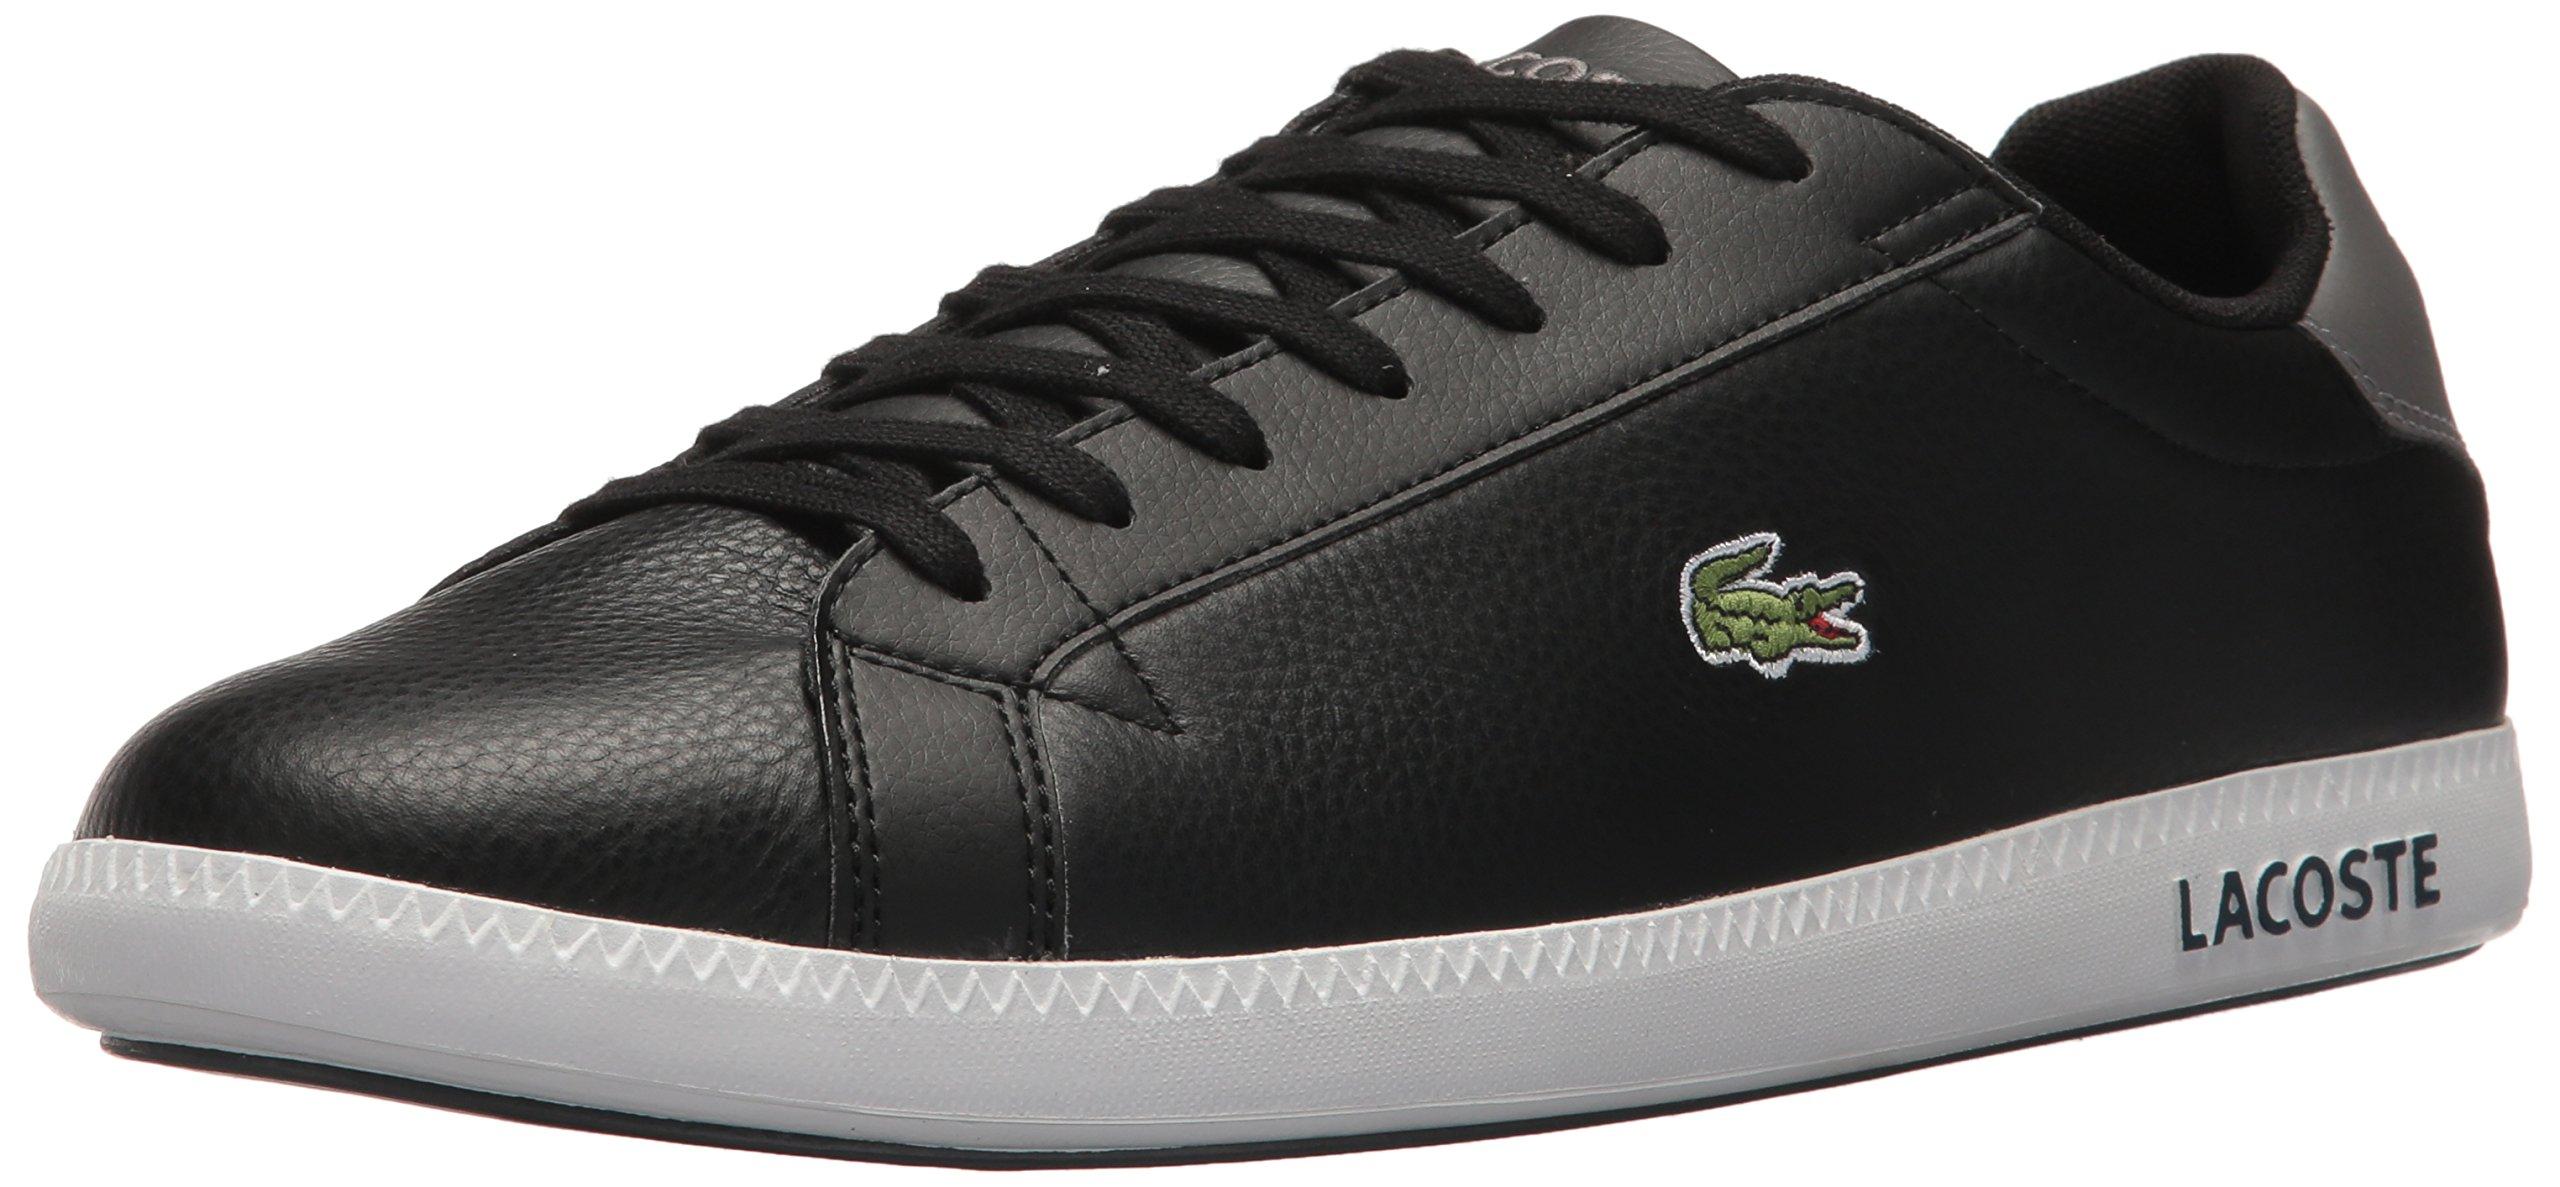 Lacoste Men's Graduate LCR3 Sneakers,Grey leather,7